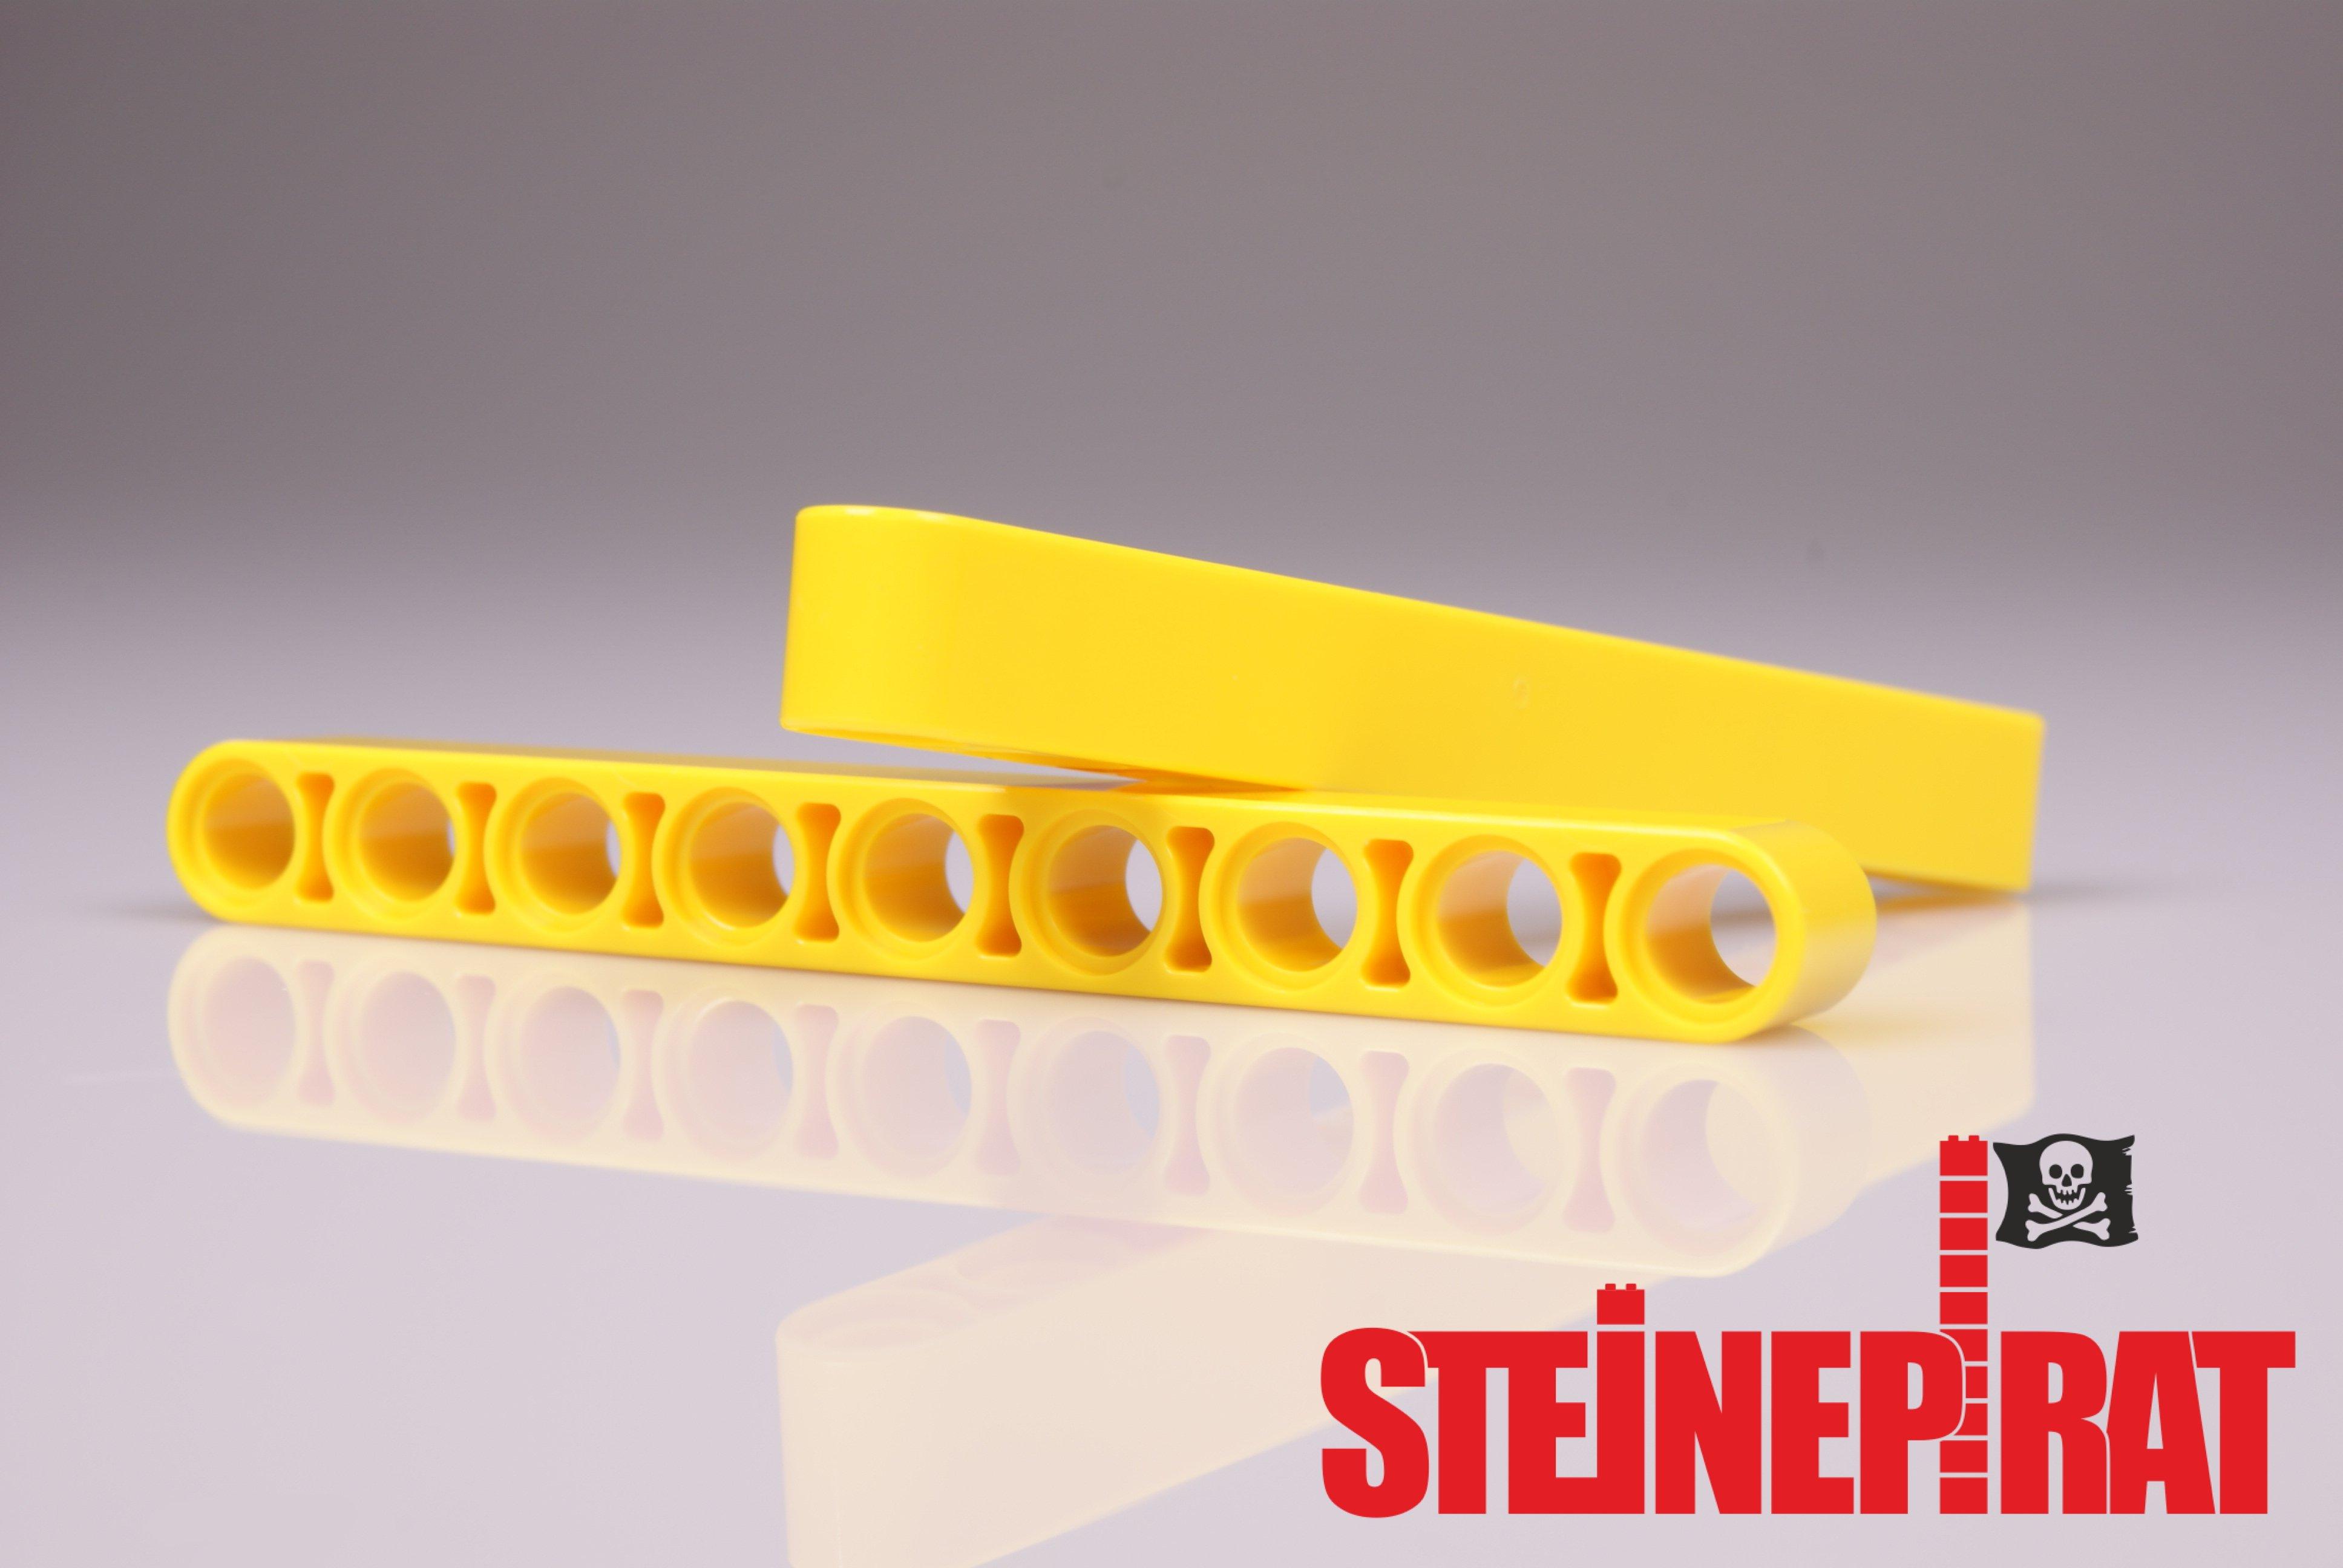 10x Lego Technic Liftarme 1x9 gelb 40490 Technik